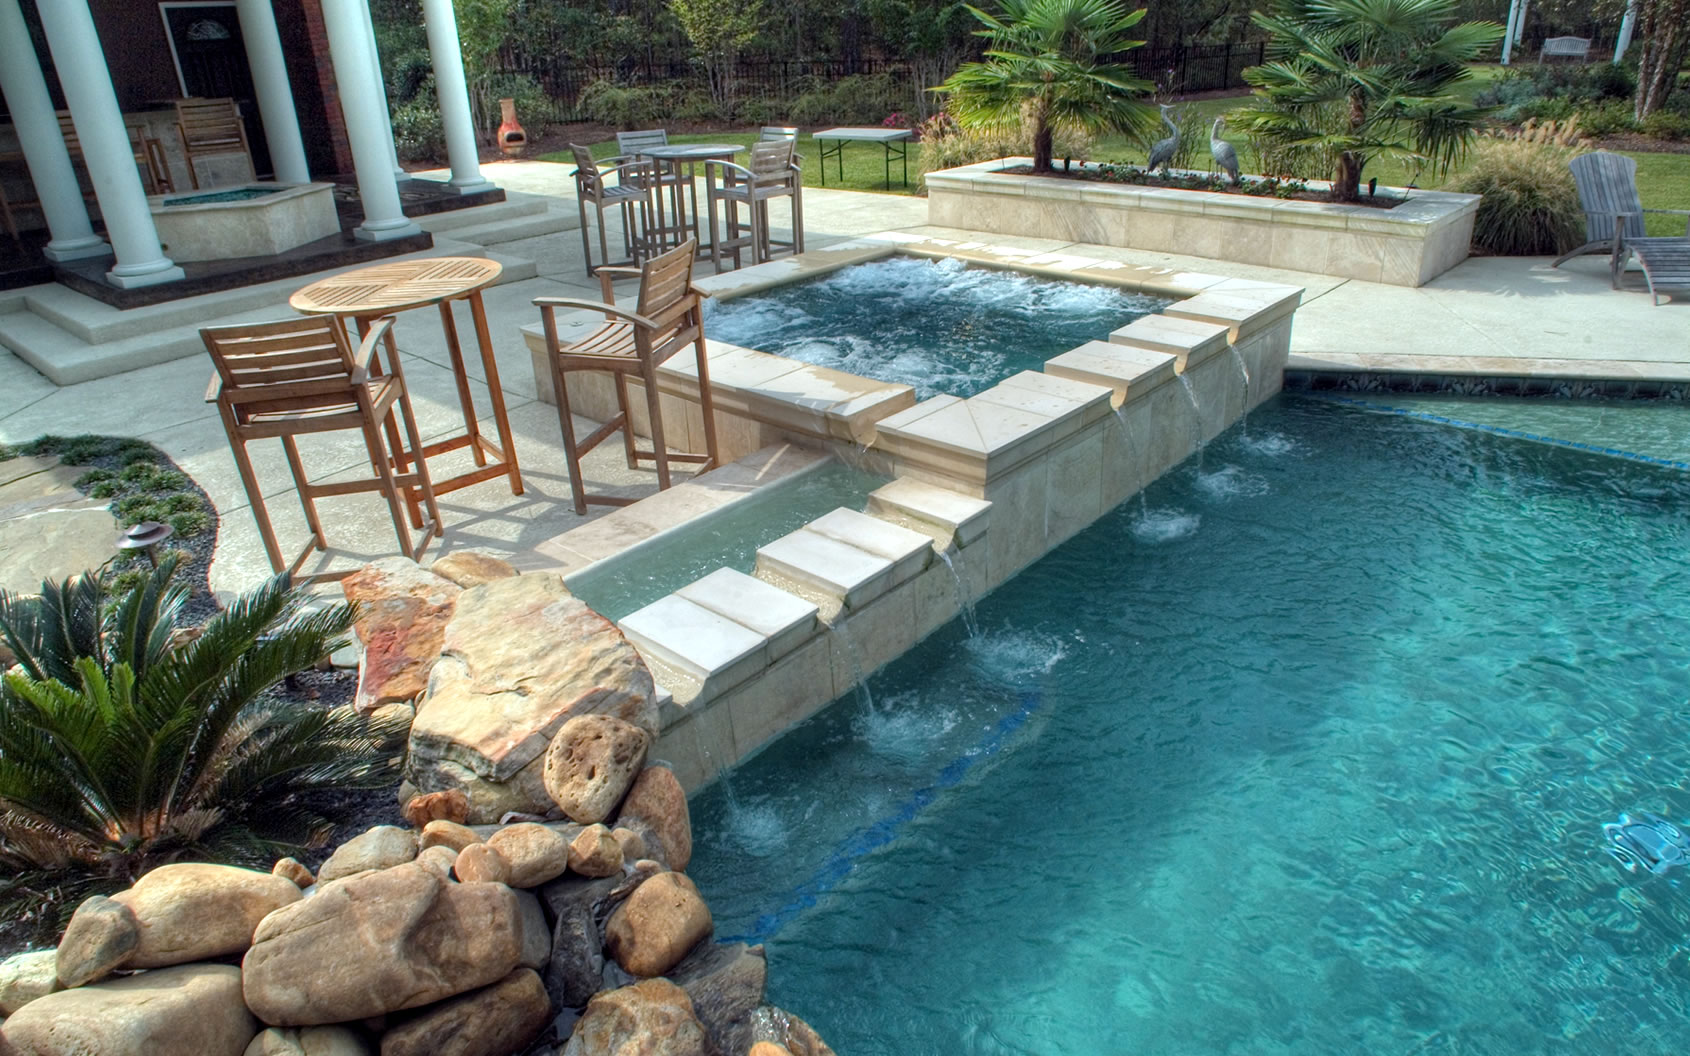 Pool Designer designer pools outdoor living central texas pool builder austin pool builder austin South Carolina Pool Designer